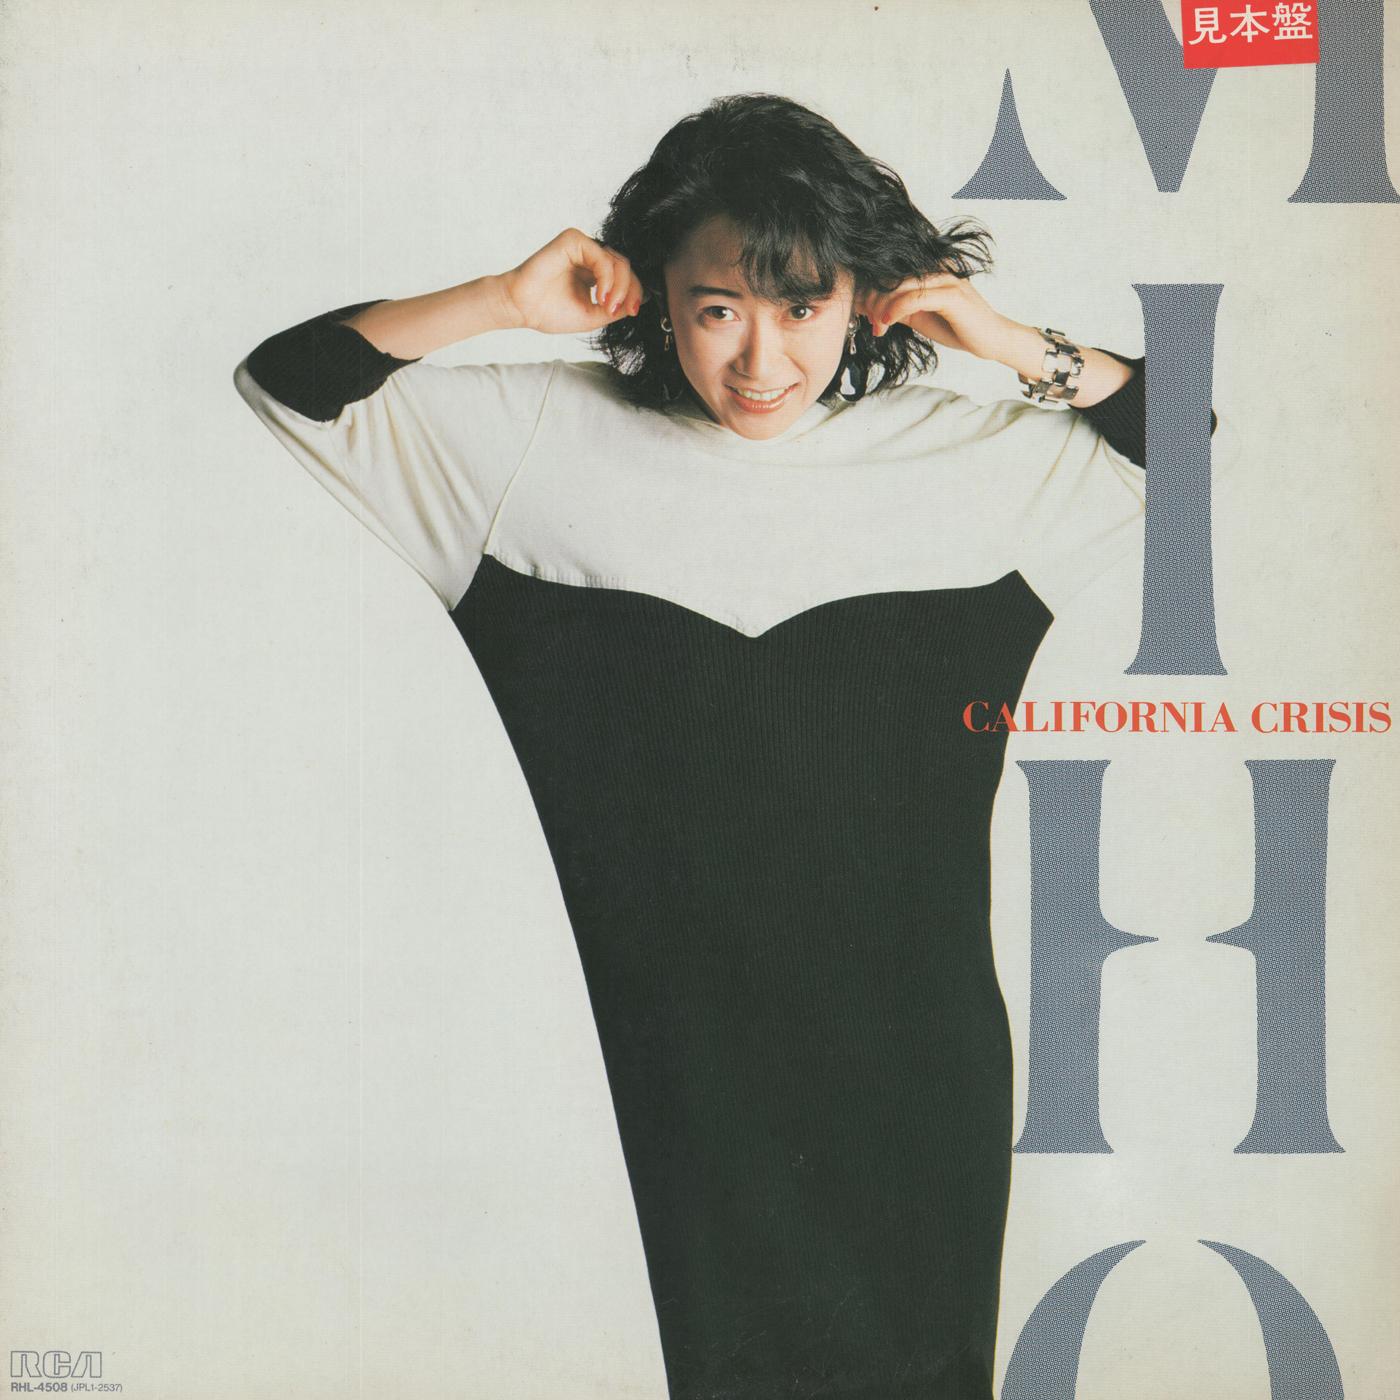 20181207.1339.16 Miho Fujiwara - California Crisis - Tsuigeki no Hibana (1986) (vinil) (FLAC) cover.jpg